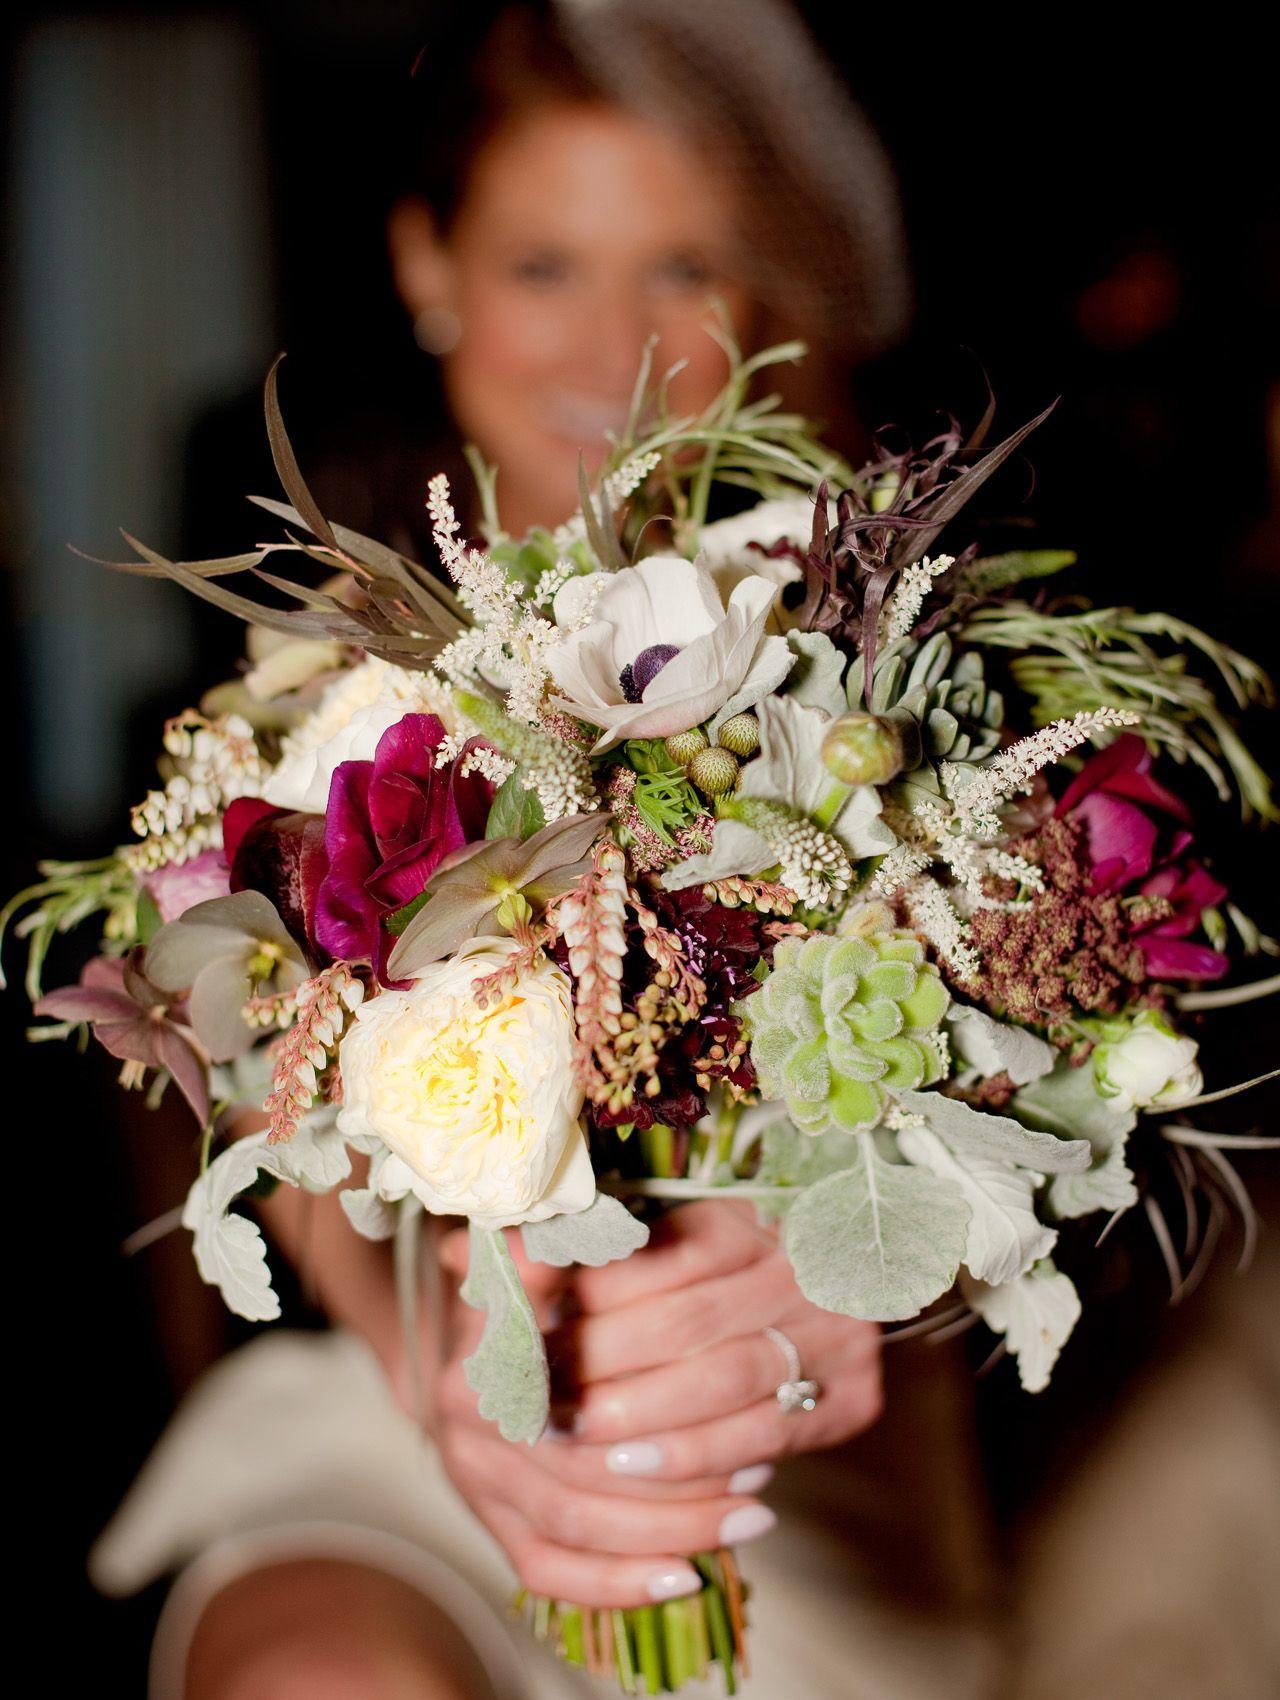 ChristopherWhite_Jordan_wedding_7.jpg